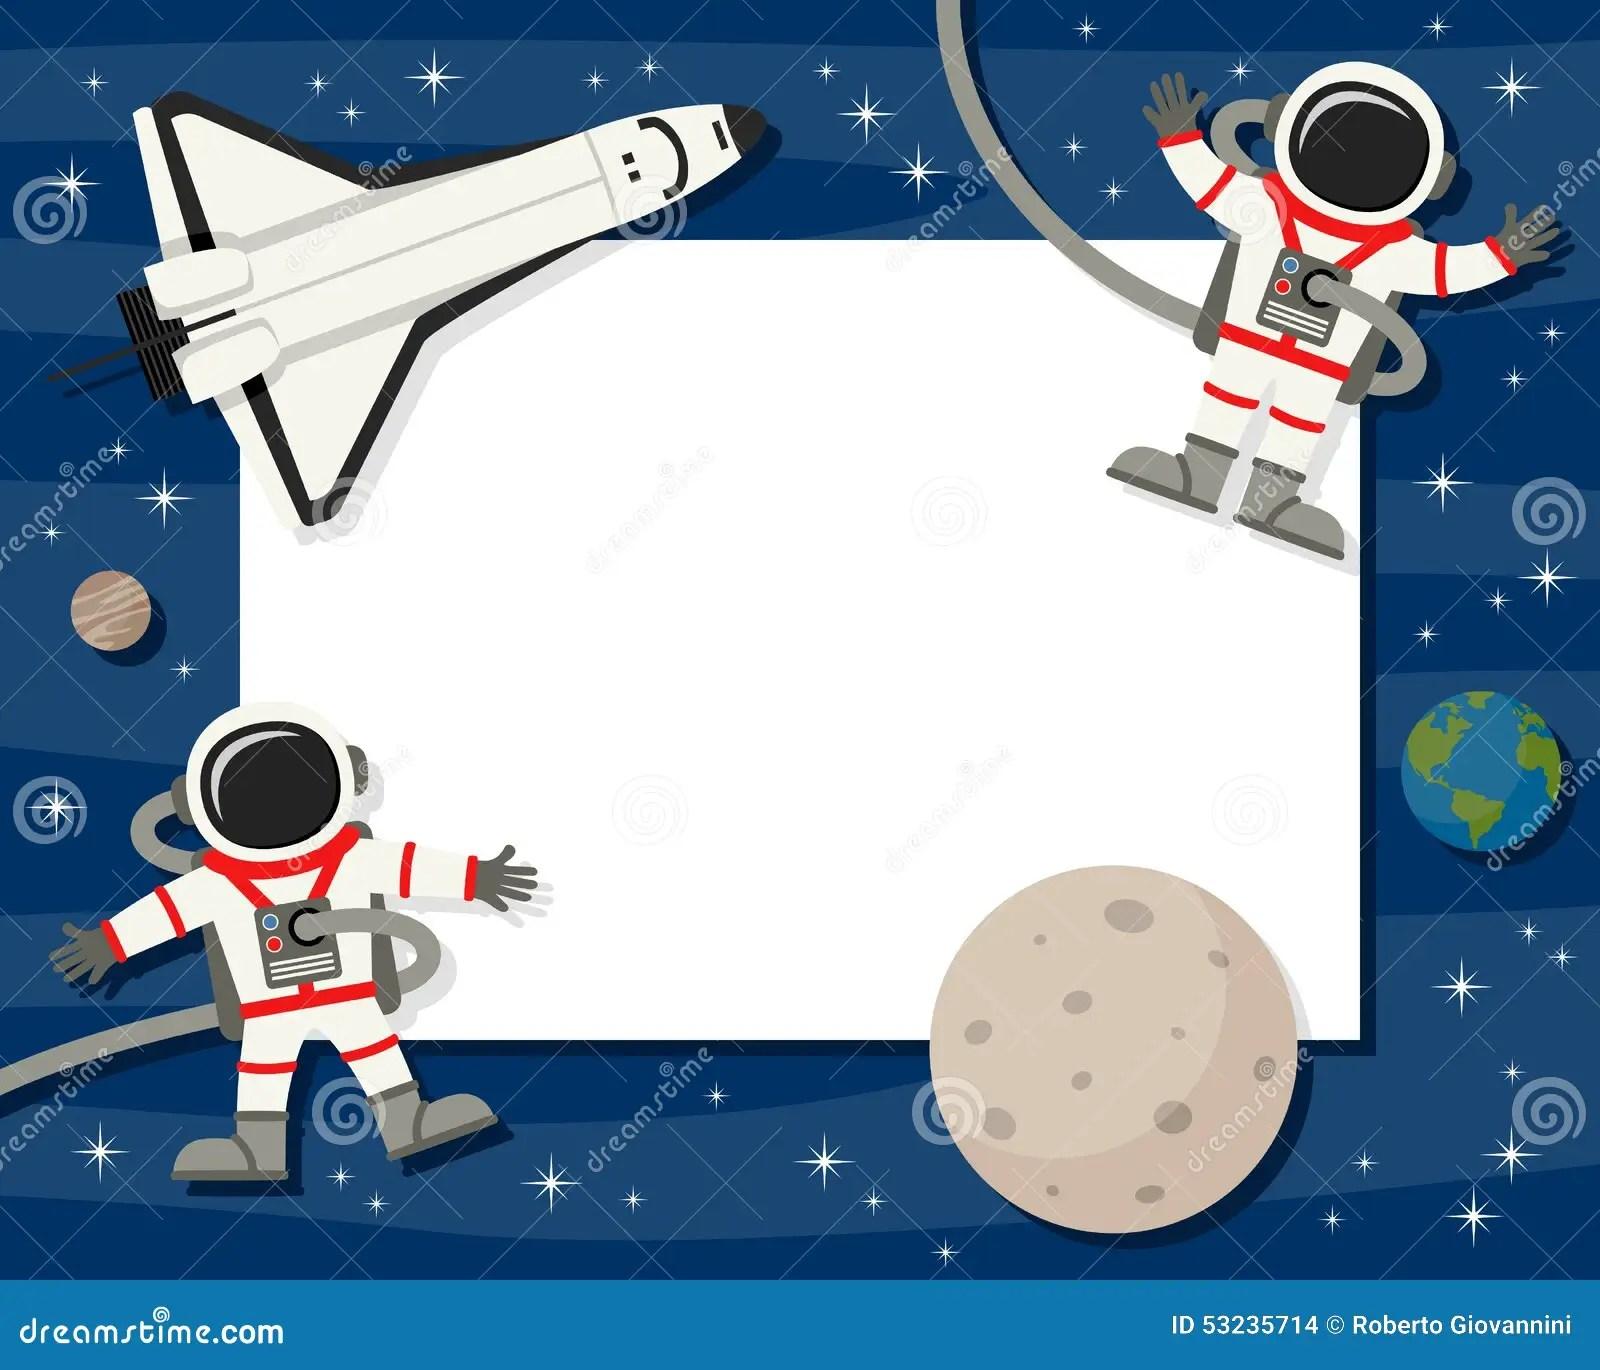 Astronauts Amp Shuttle Horizontal Frame Stock Vector